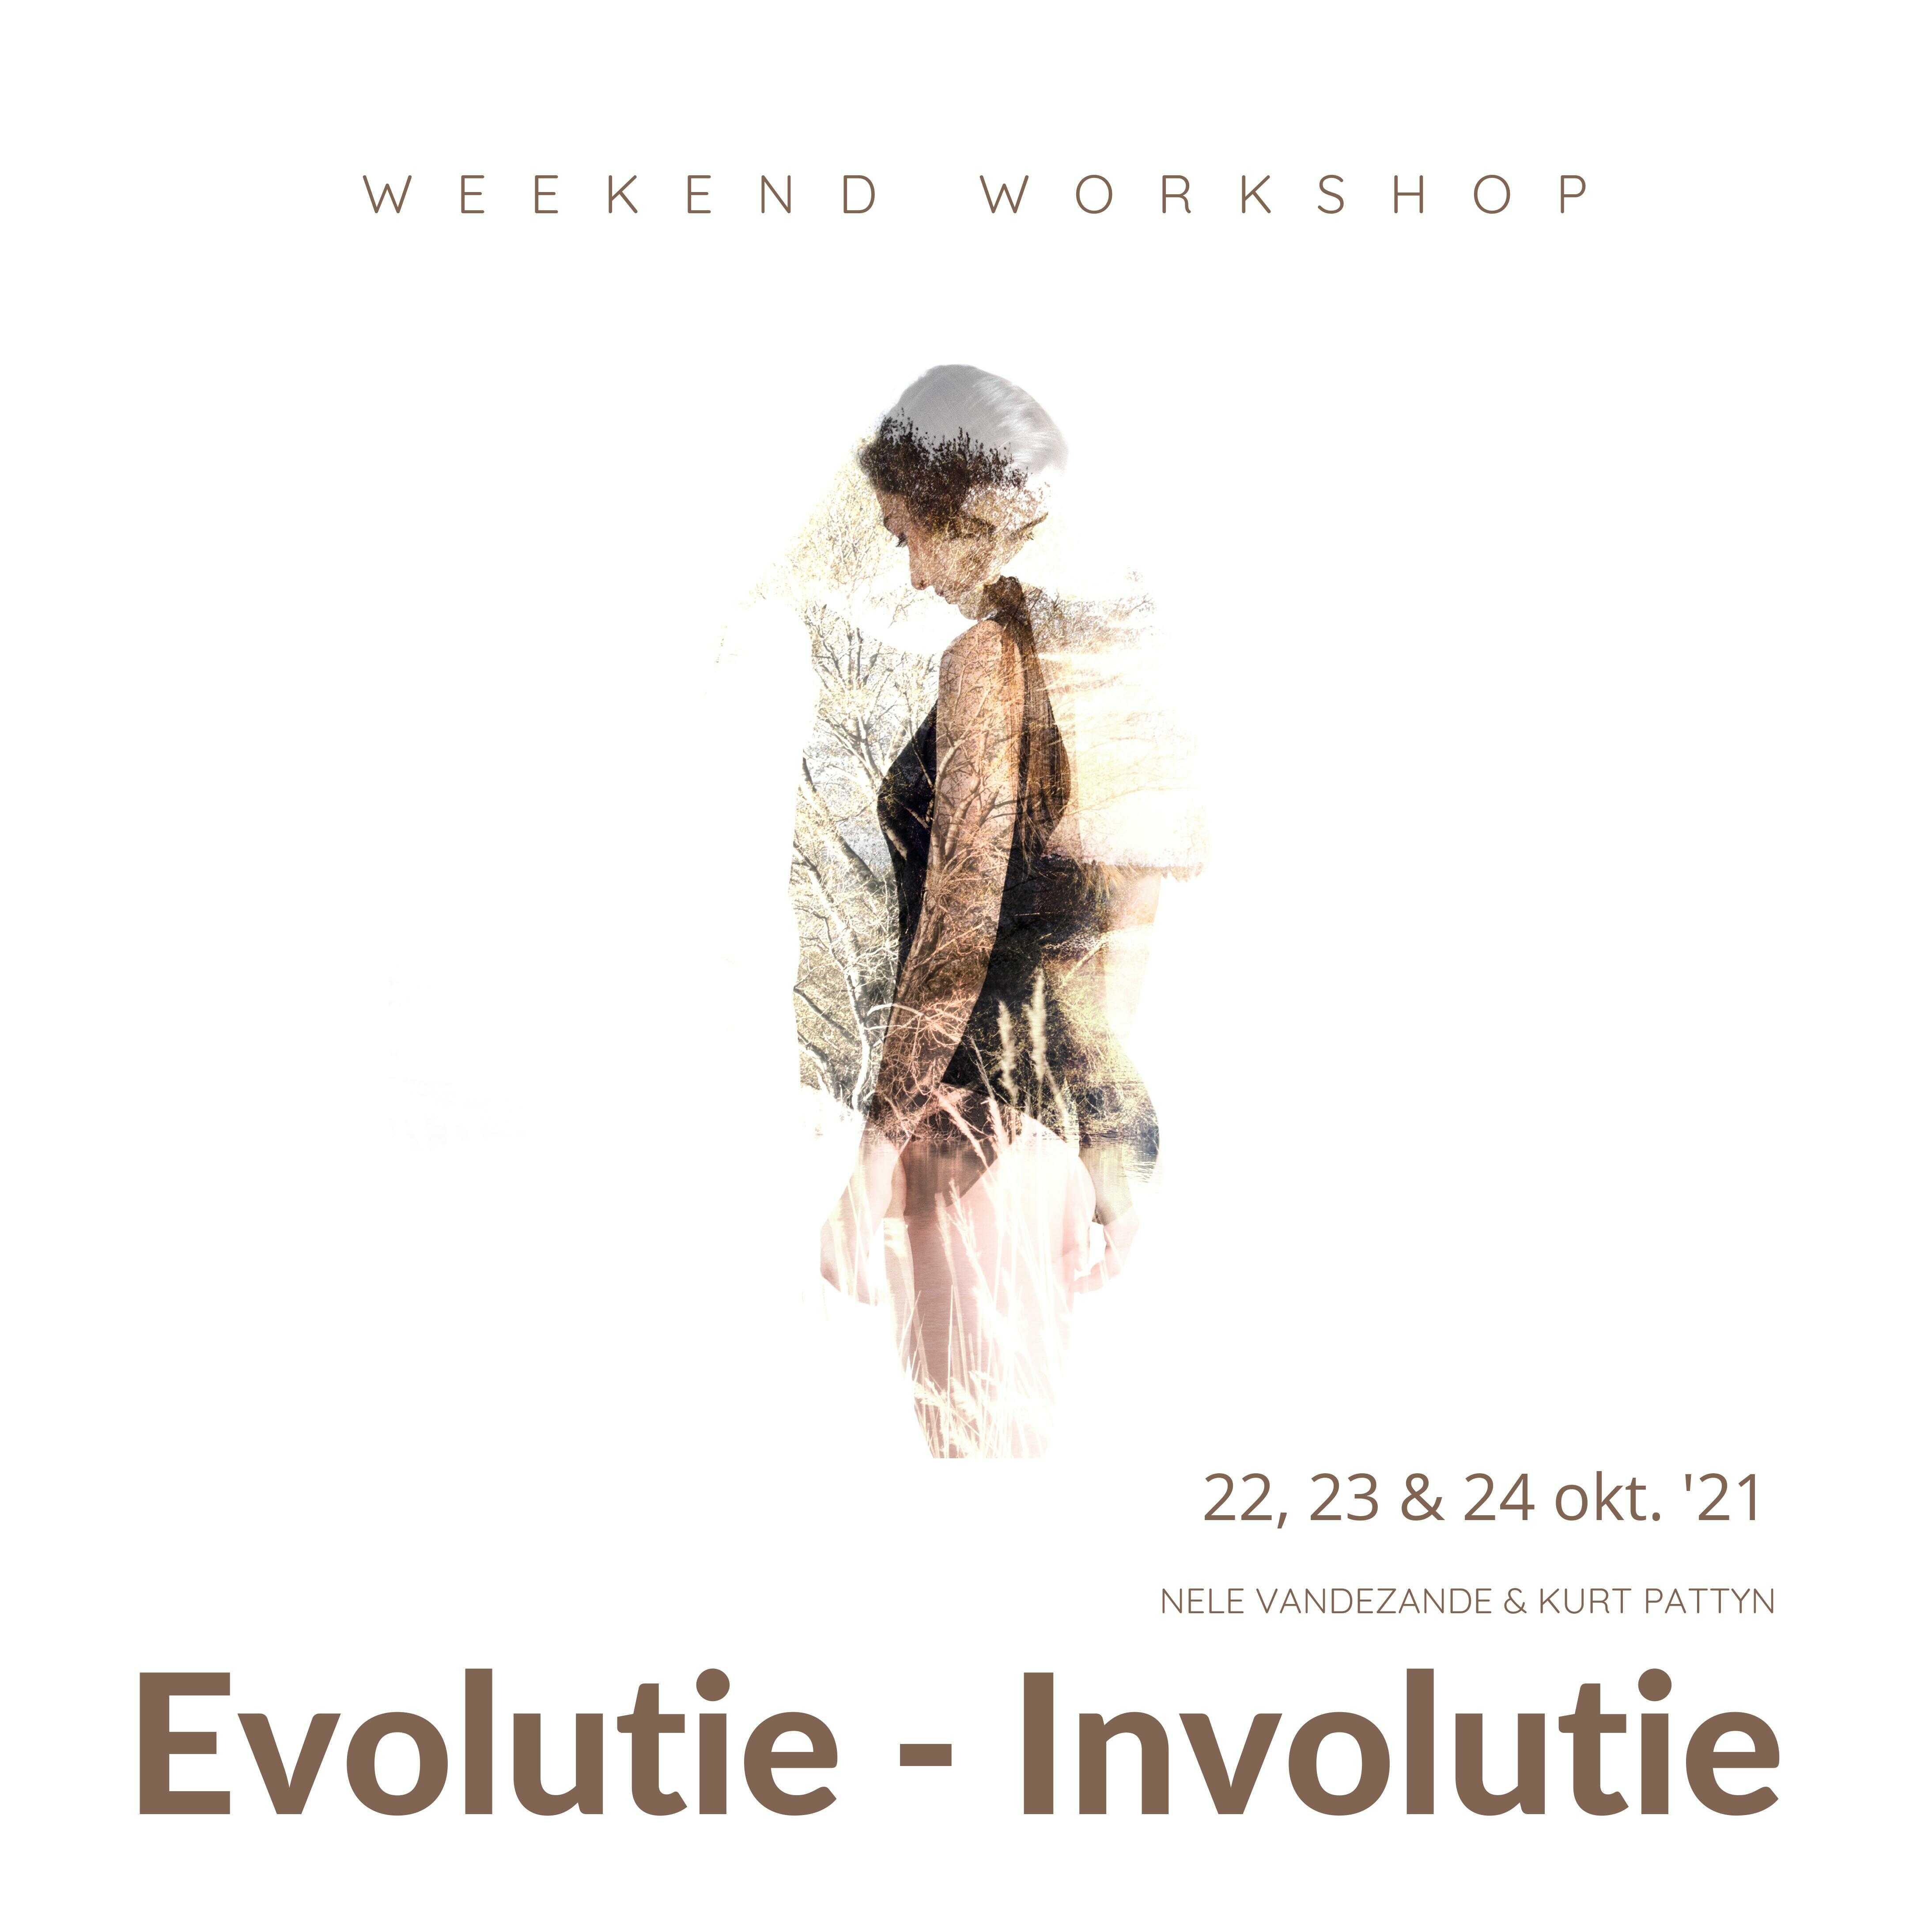 evolutie---involutie_optimized